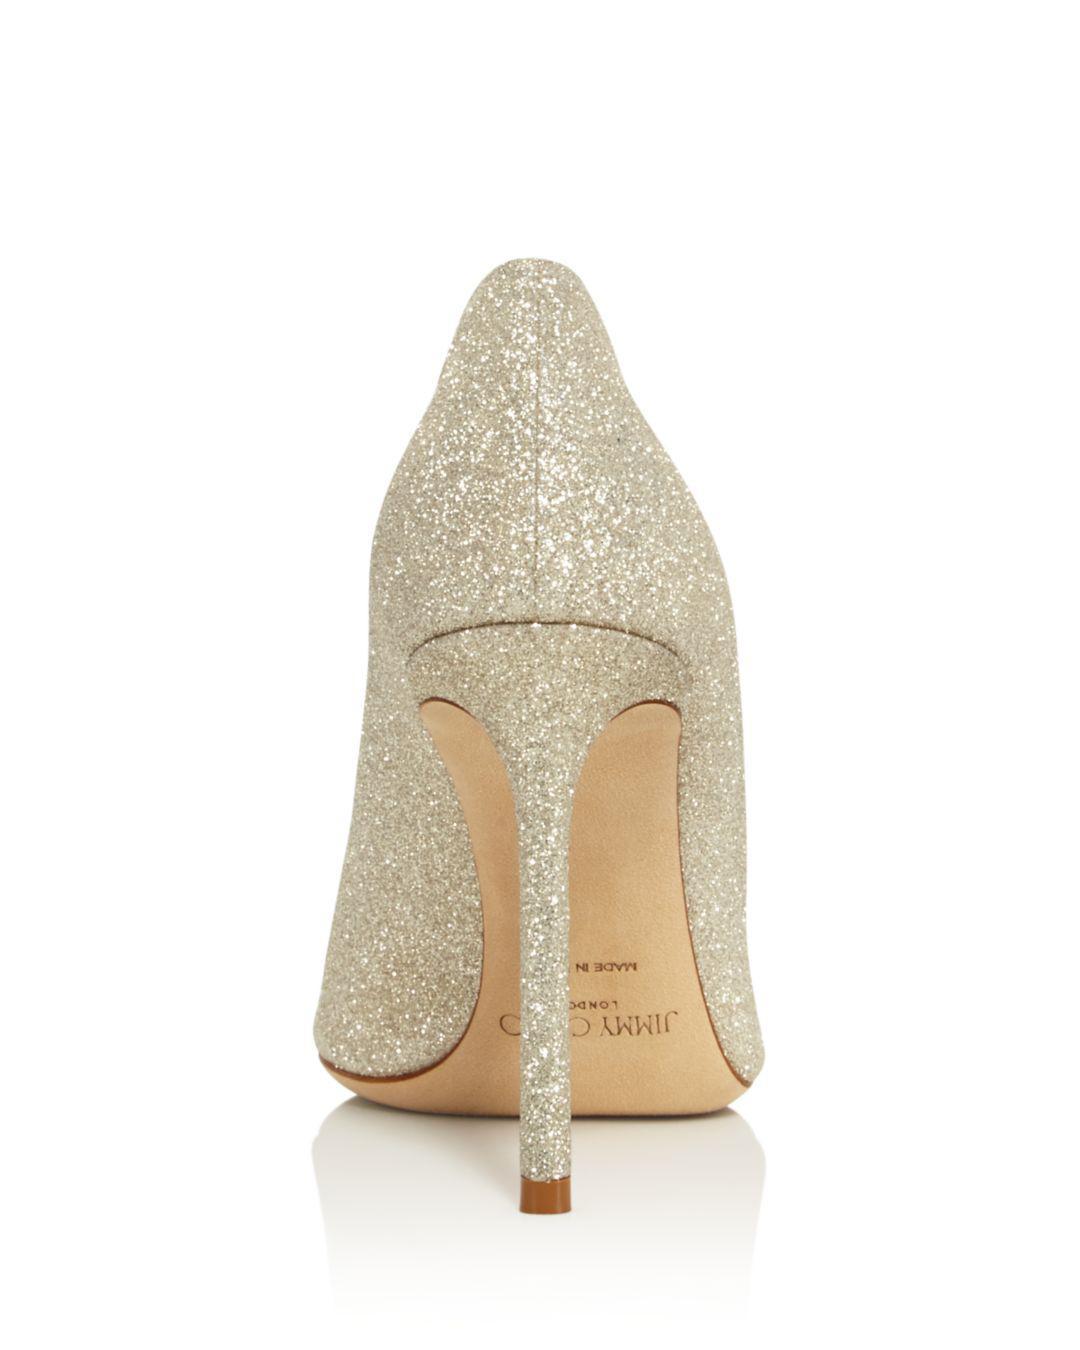 8258b29155d7 Jimmy Choo - Metallic Women s Romy 100 Glitter Leather High-heel Pumps -  Lyst. View fullscreen